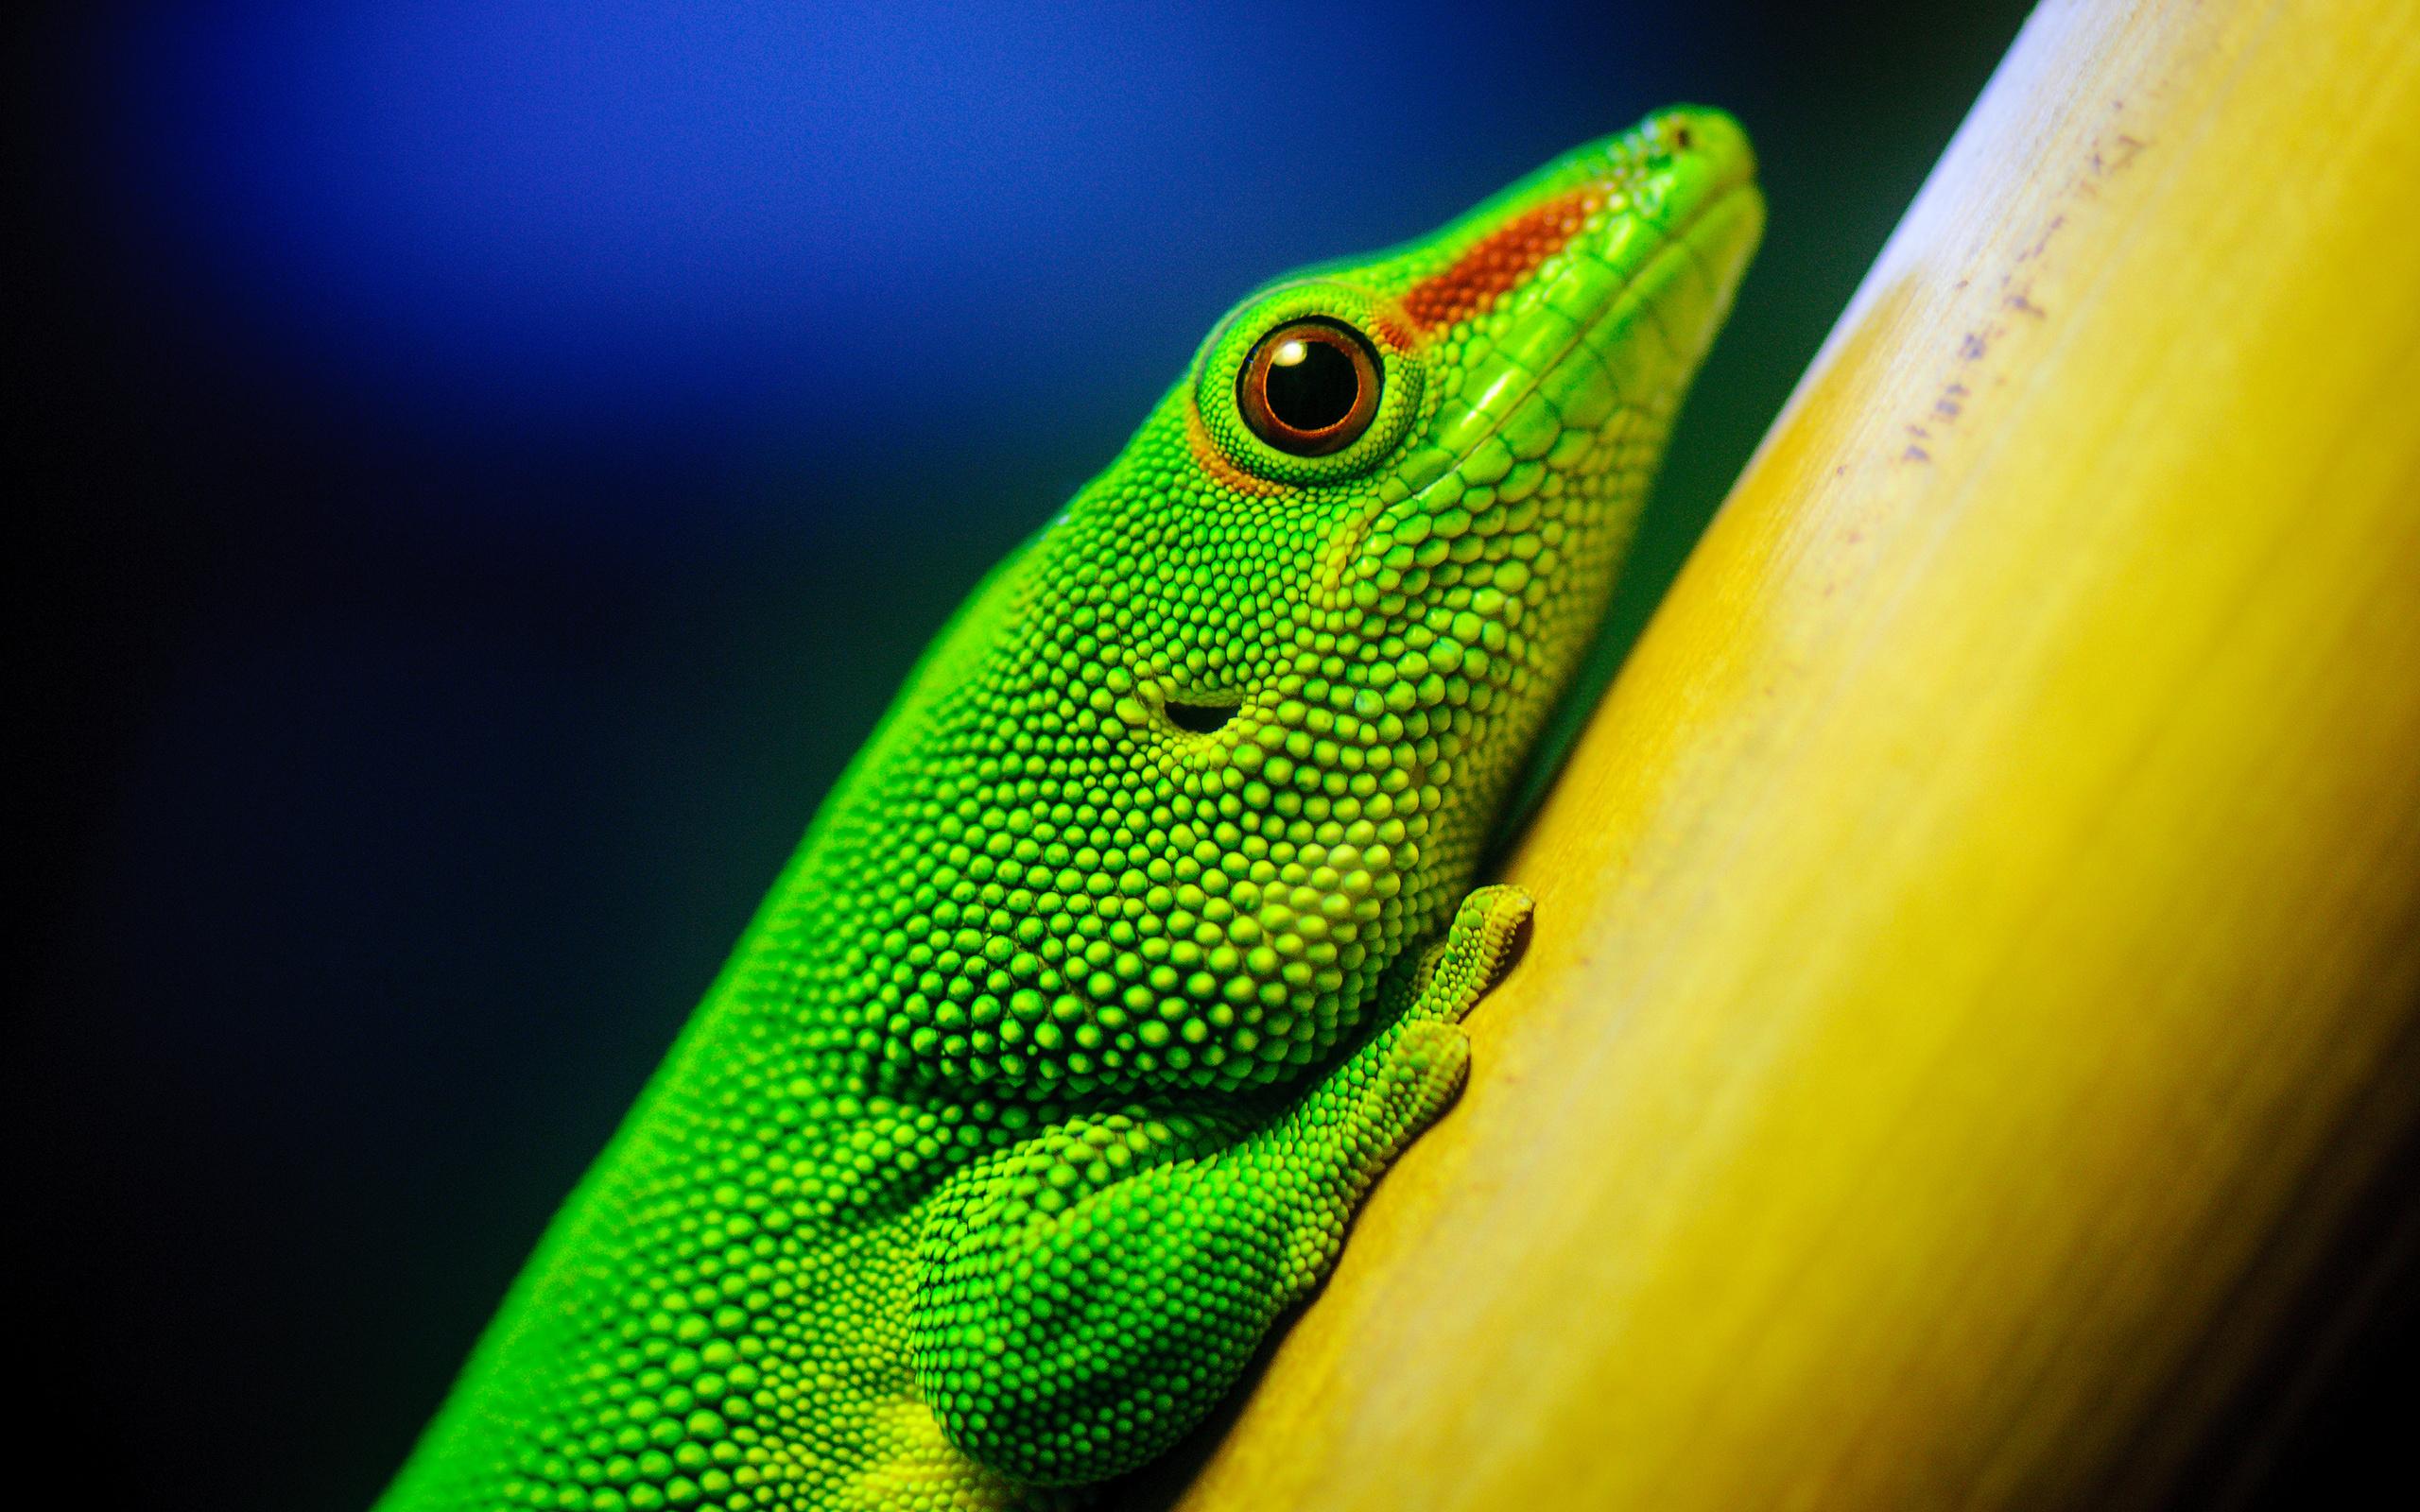 lizard computer wallpapers desktop backgrounds